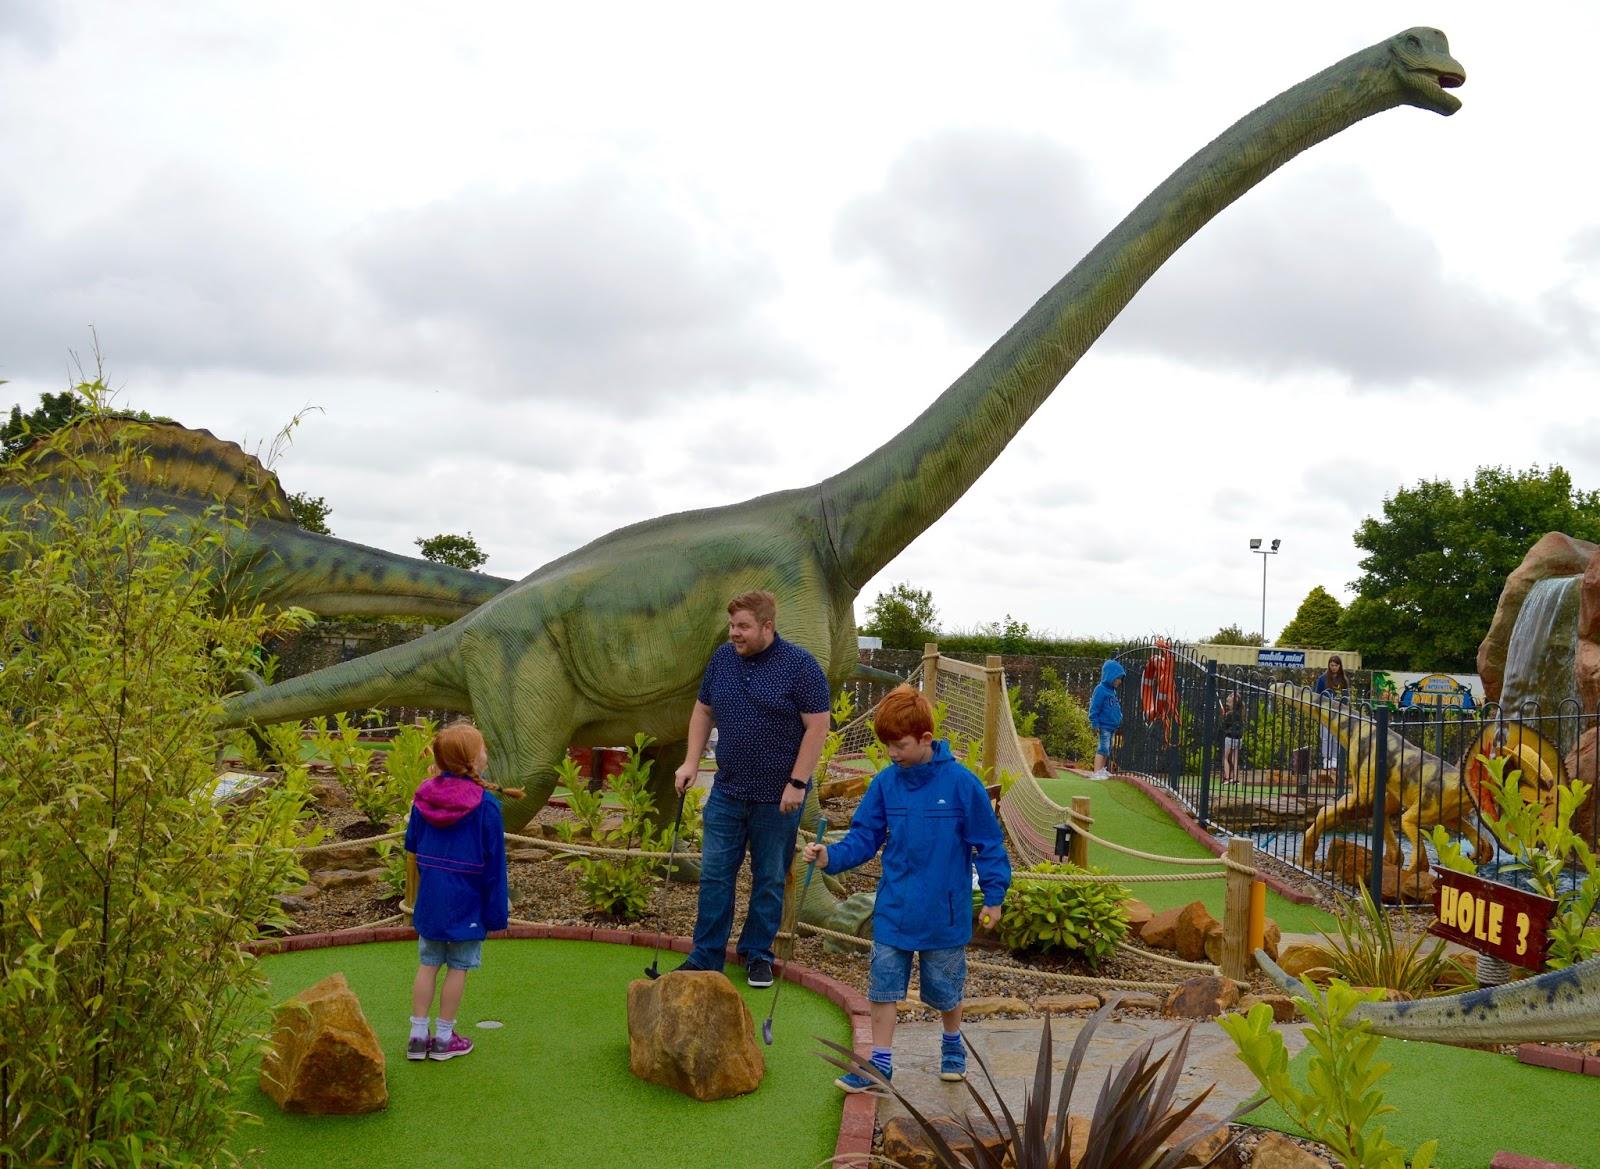 Jurassic Dinosaur Crazy Golf at Heighley Gate Garden Centre near Morpeth